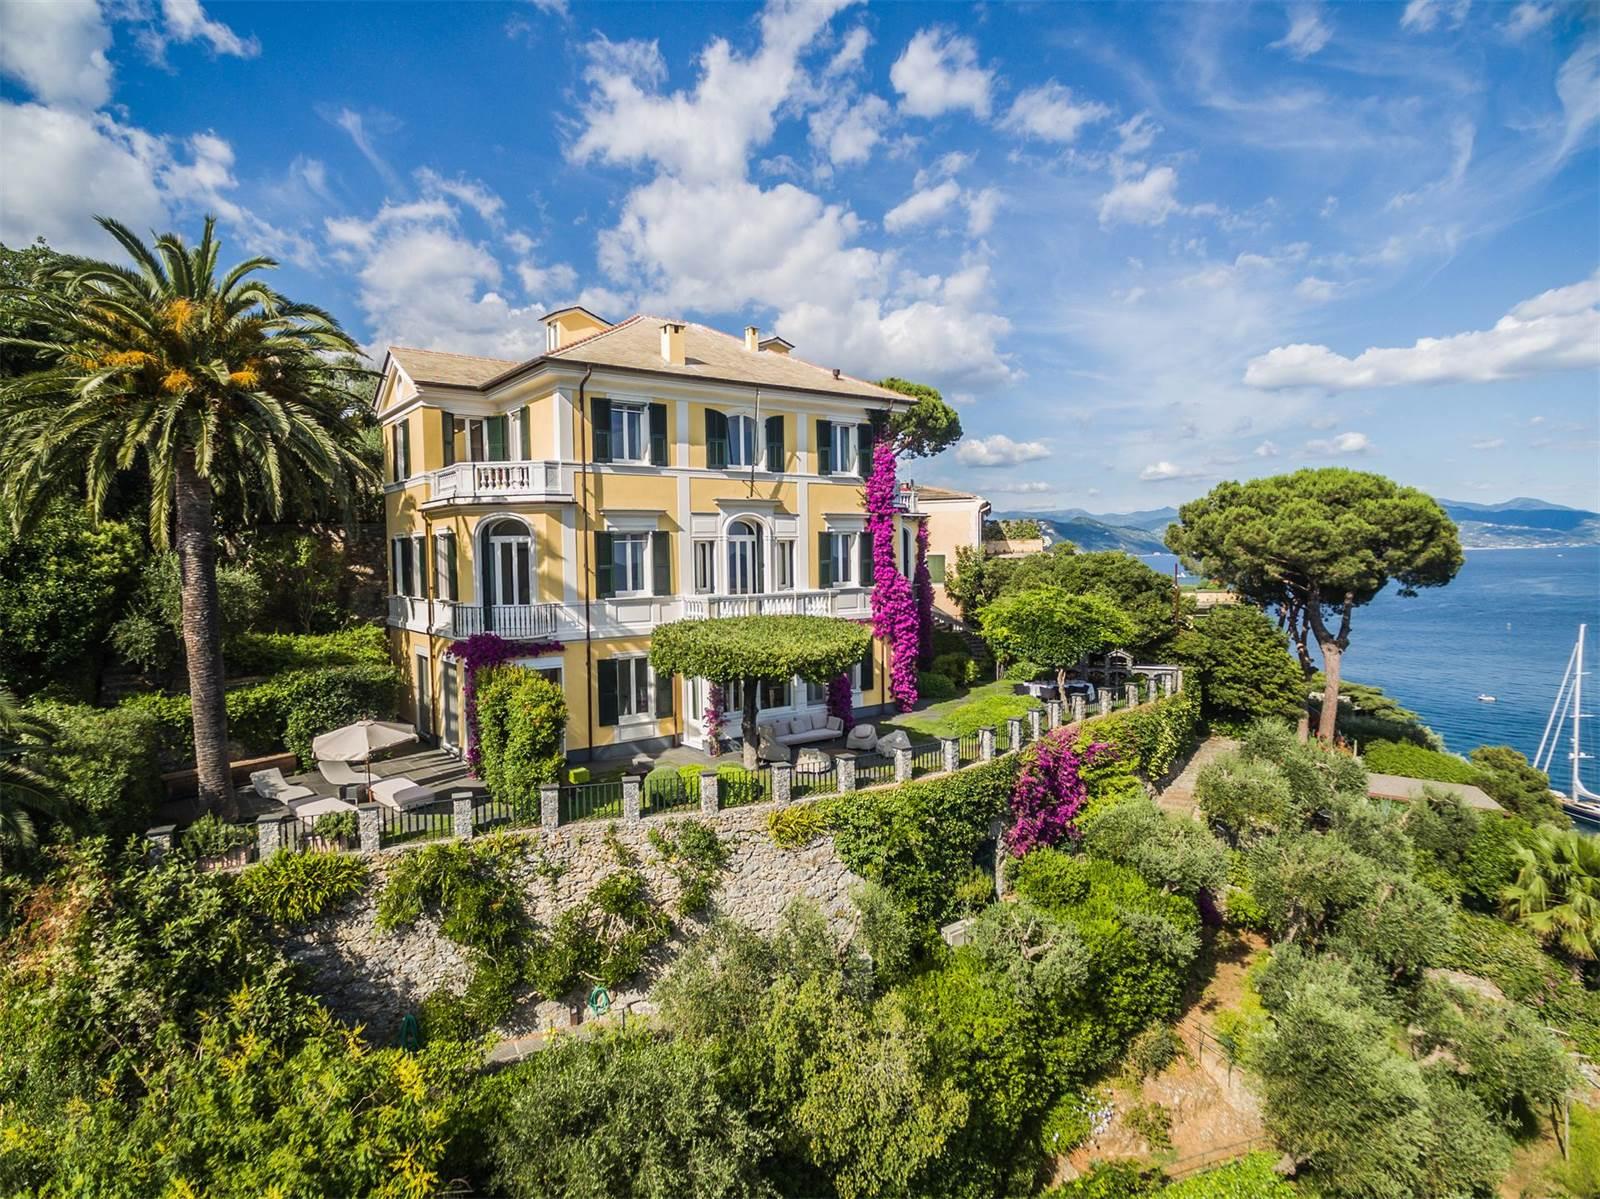 This beautiful Genoese mansion overlooks the Ligurian Sea from its idyllic hillside location above Portofino Bay.